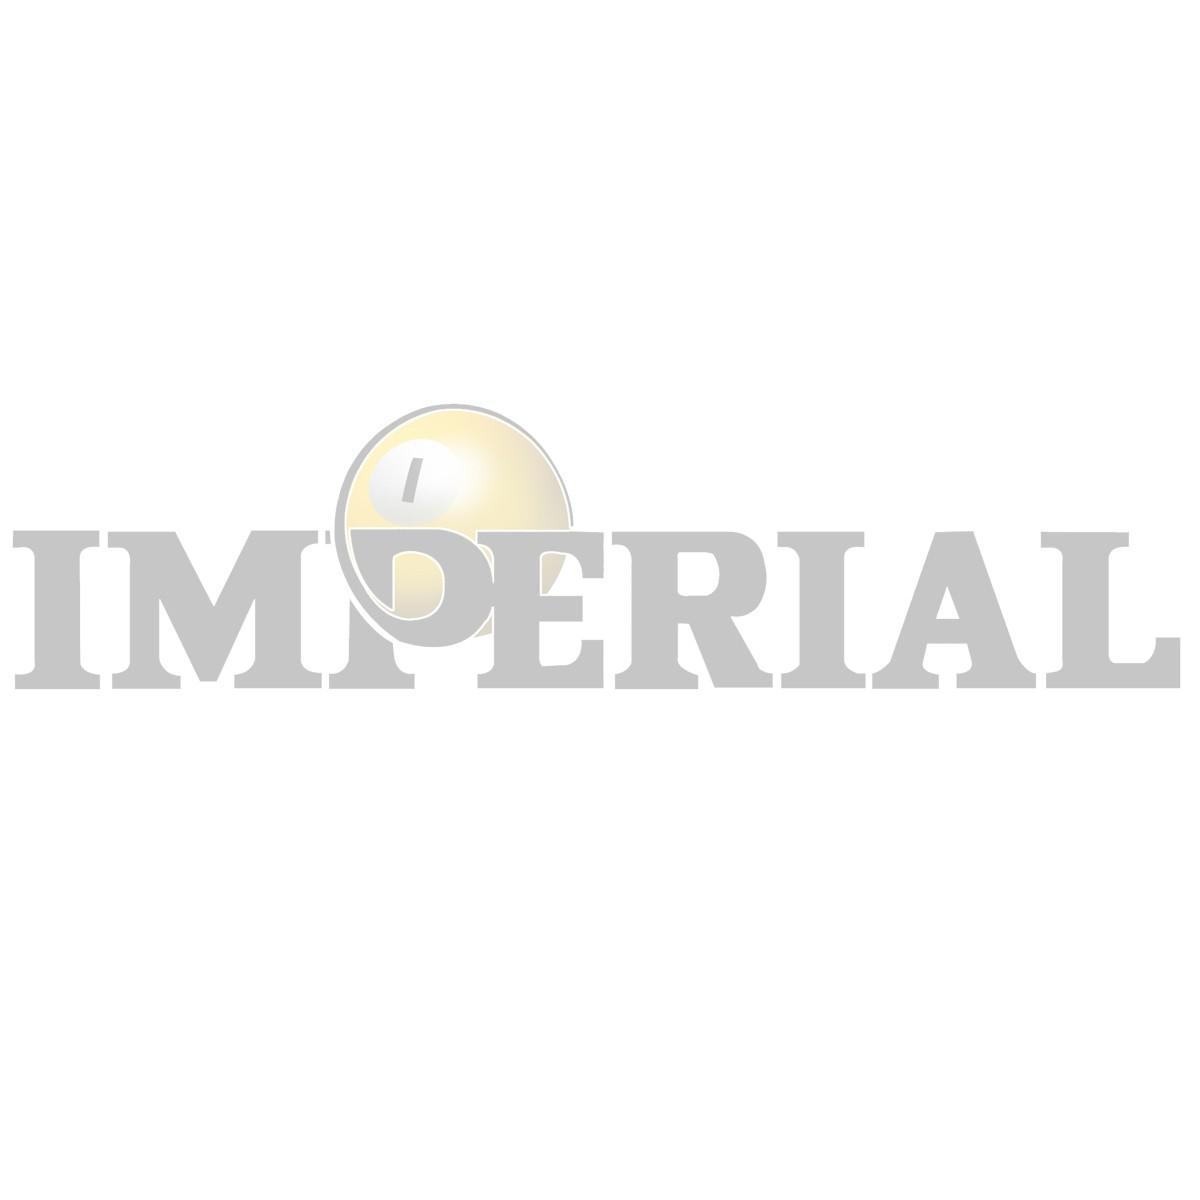 Detroit Lions Home vs. Away Billiard Ball Set